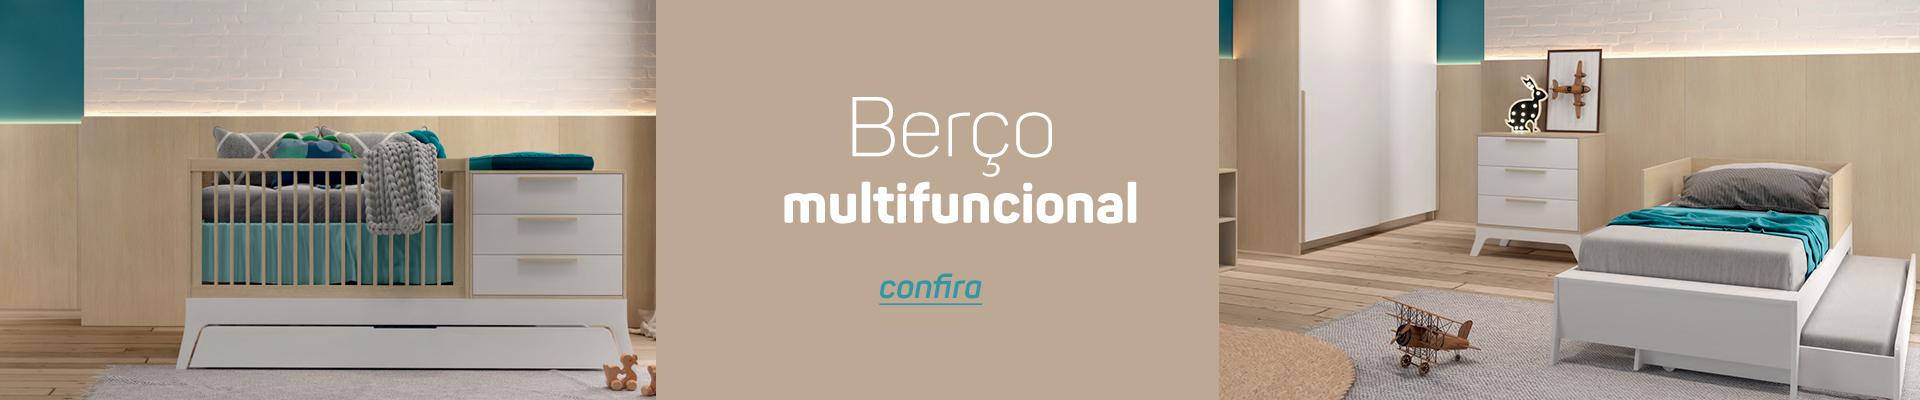 berço multifuncional1